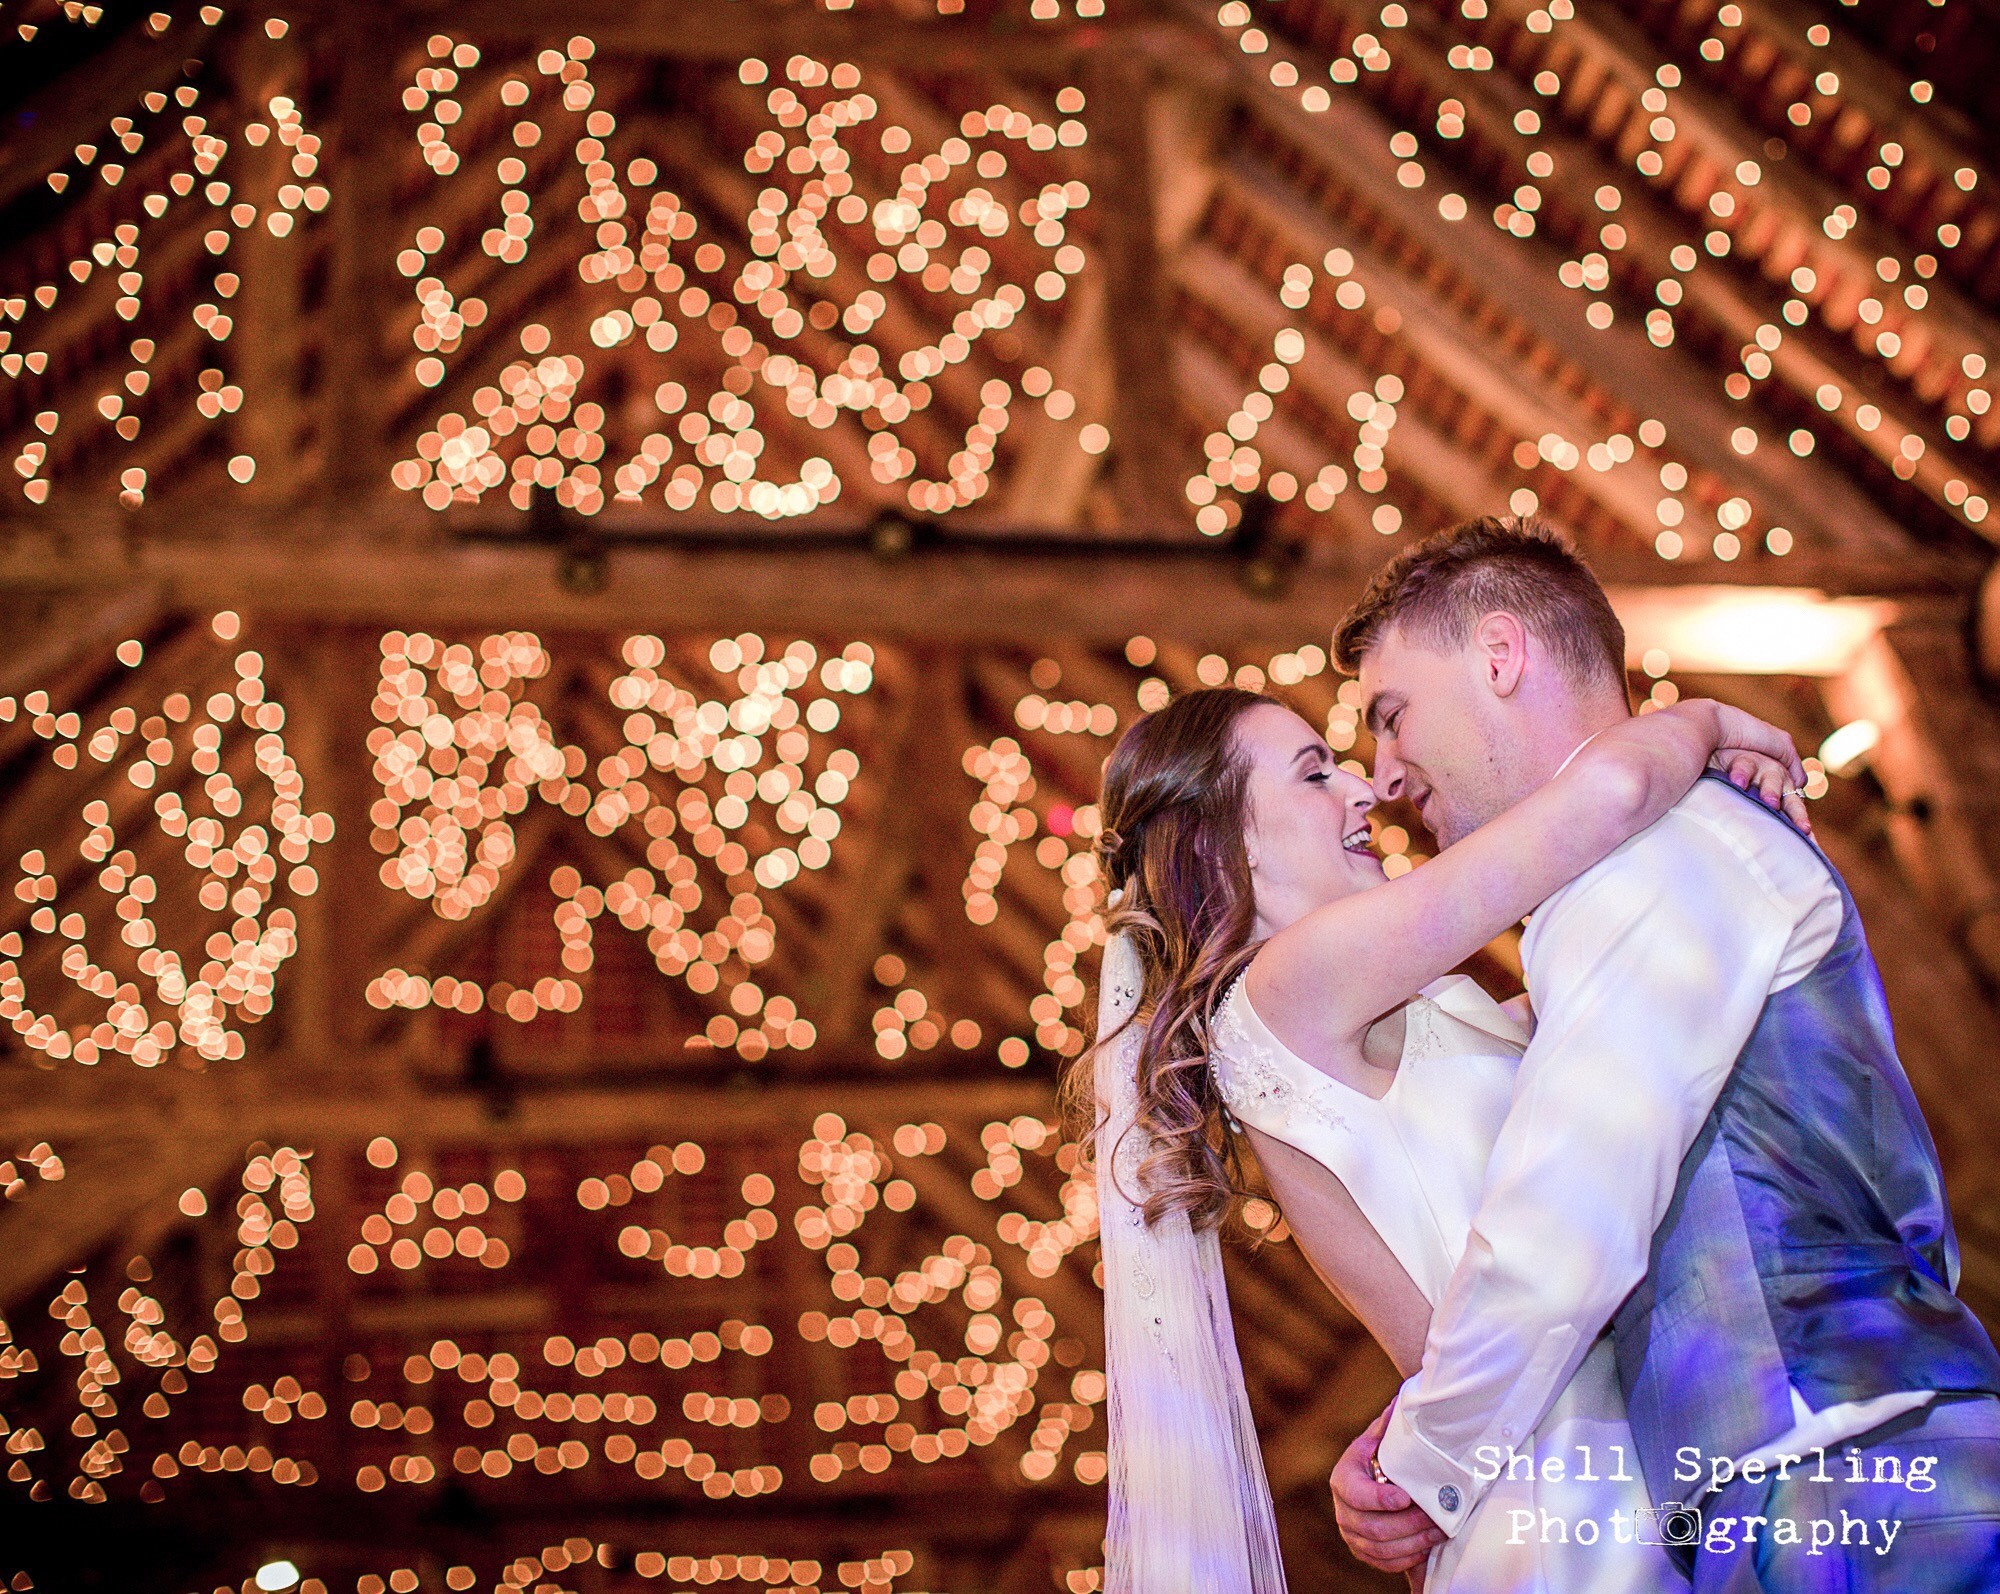 Shell Spirling Photography (instagram shell_sperling_weddings; facebook Shell Sperling Photography)